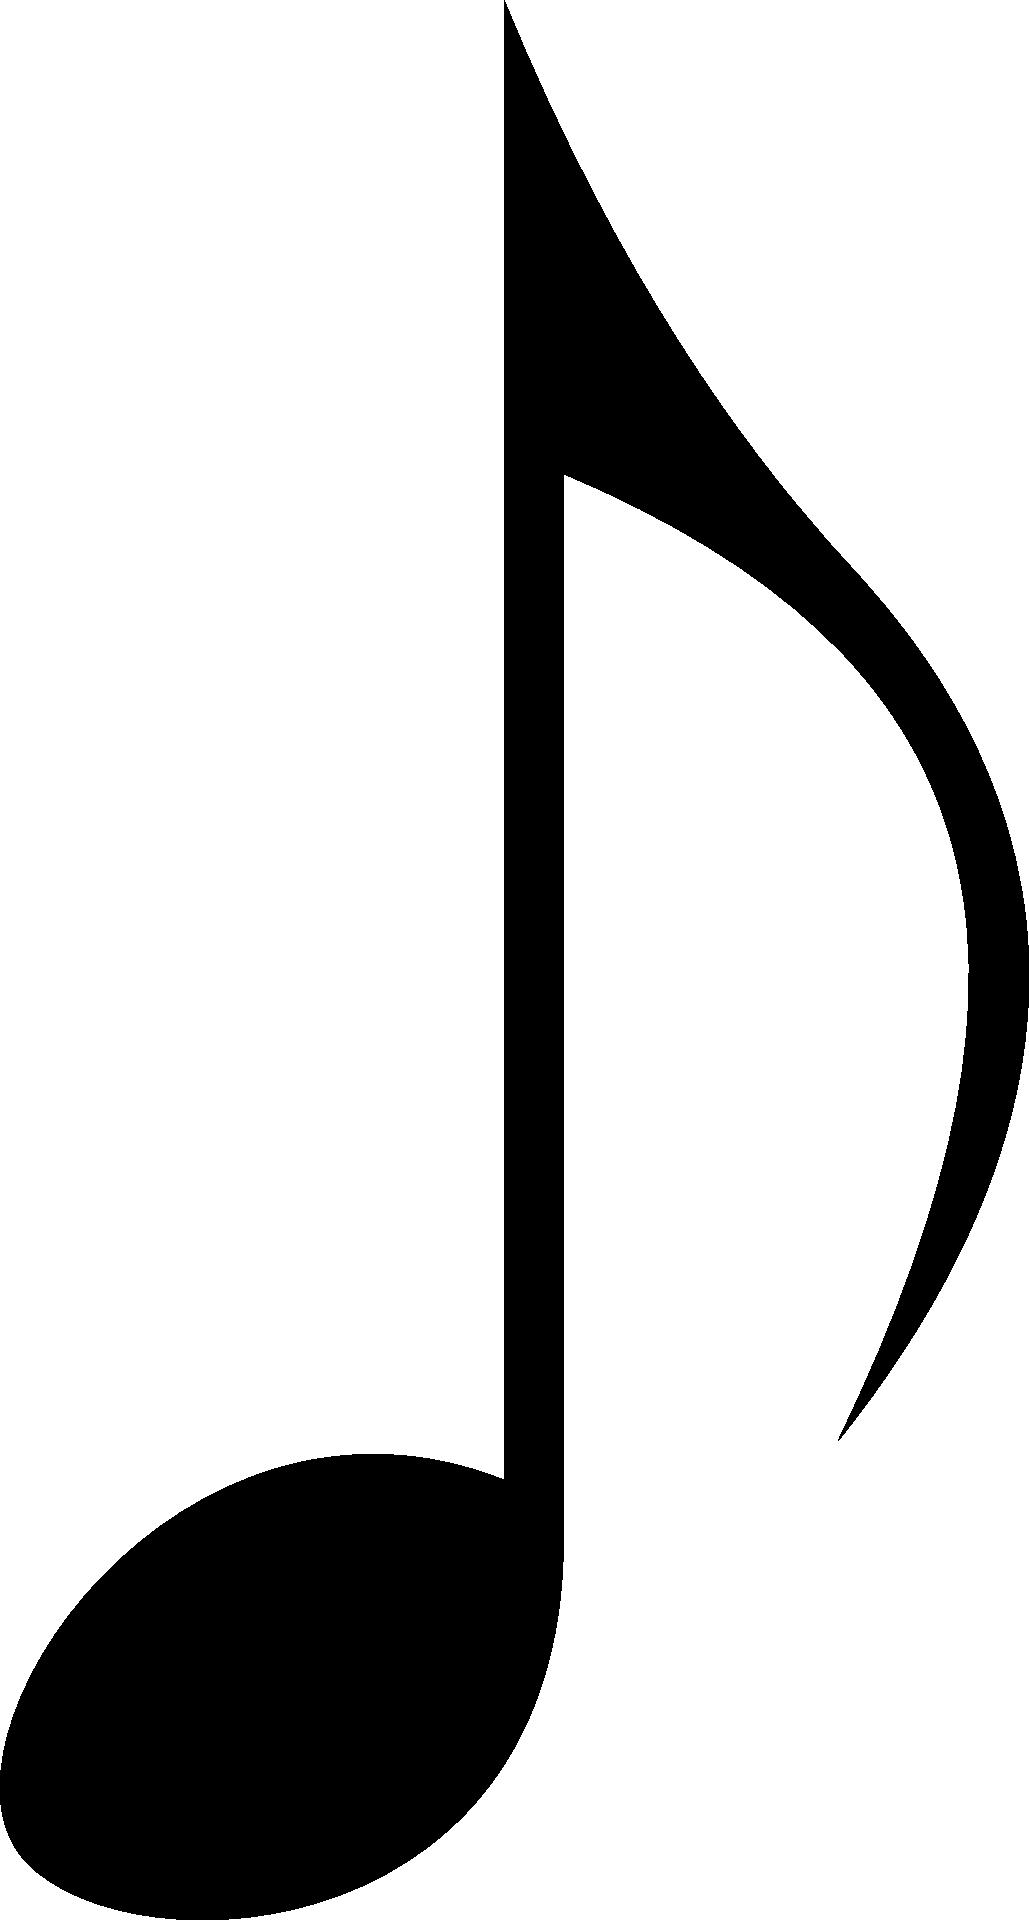 Music note symbol black sound free image